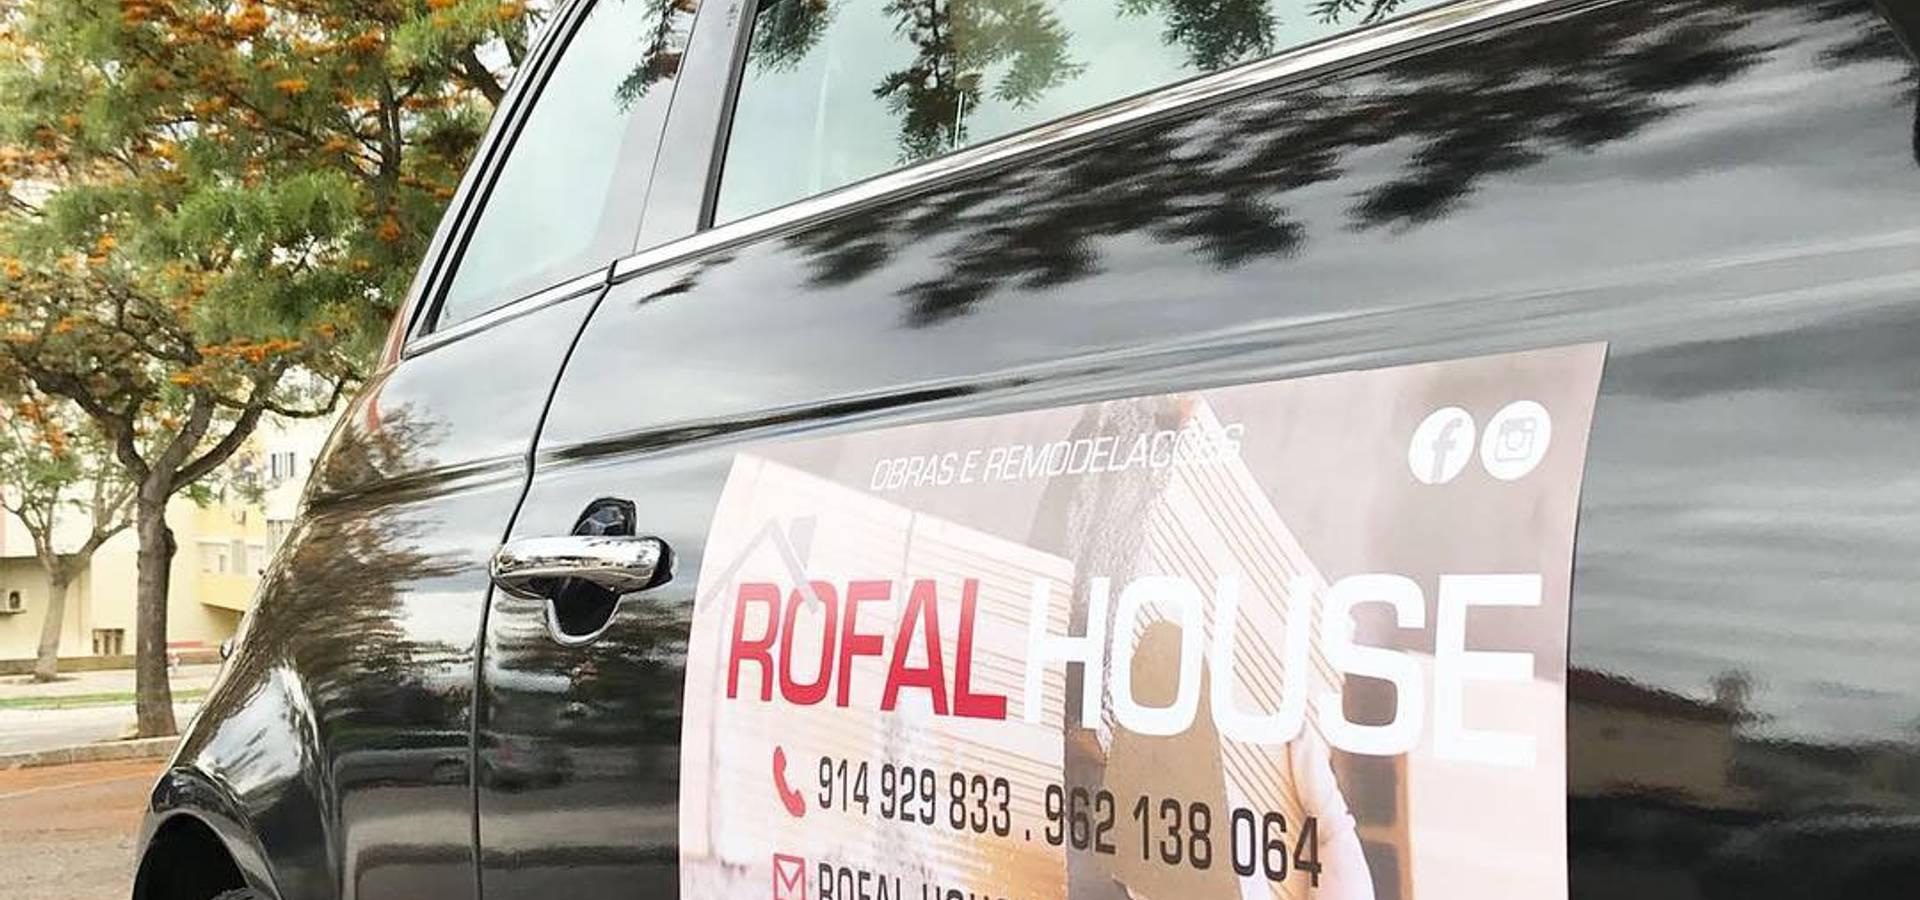 Rofal House Lda